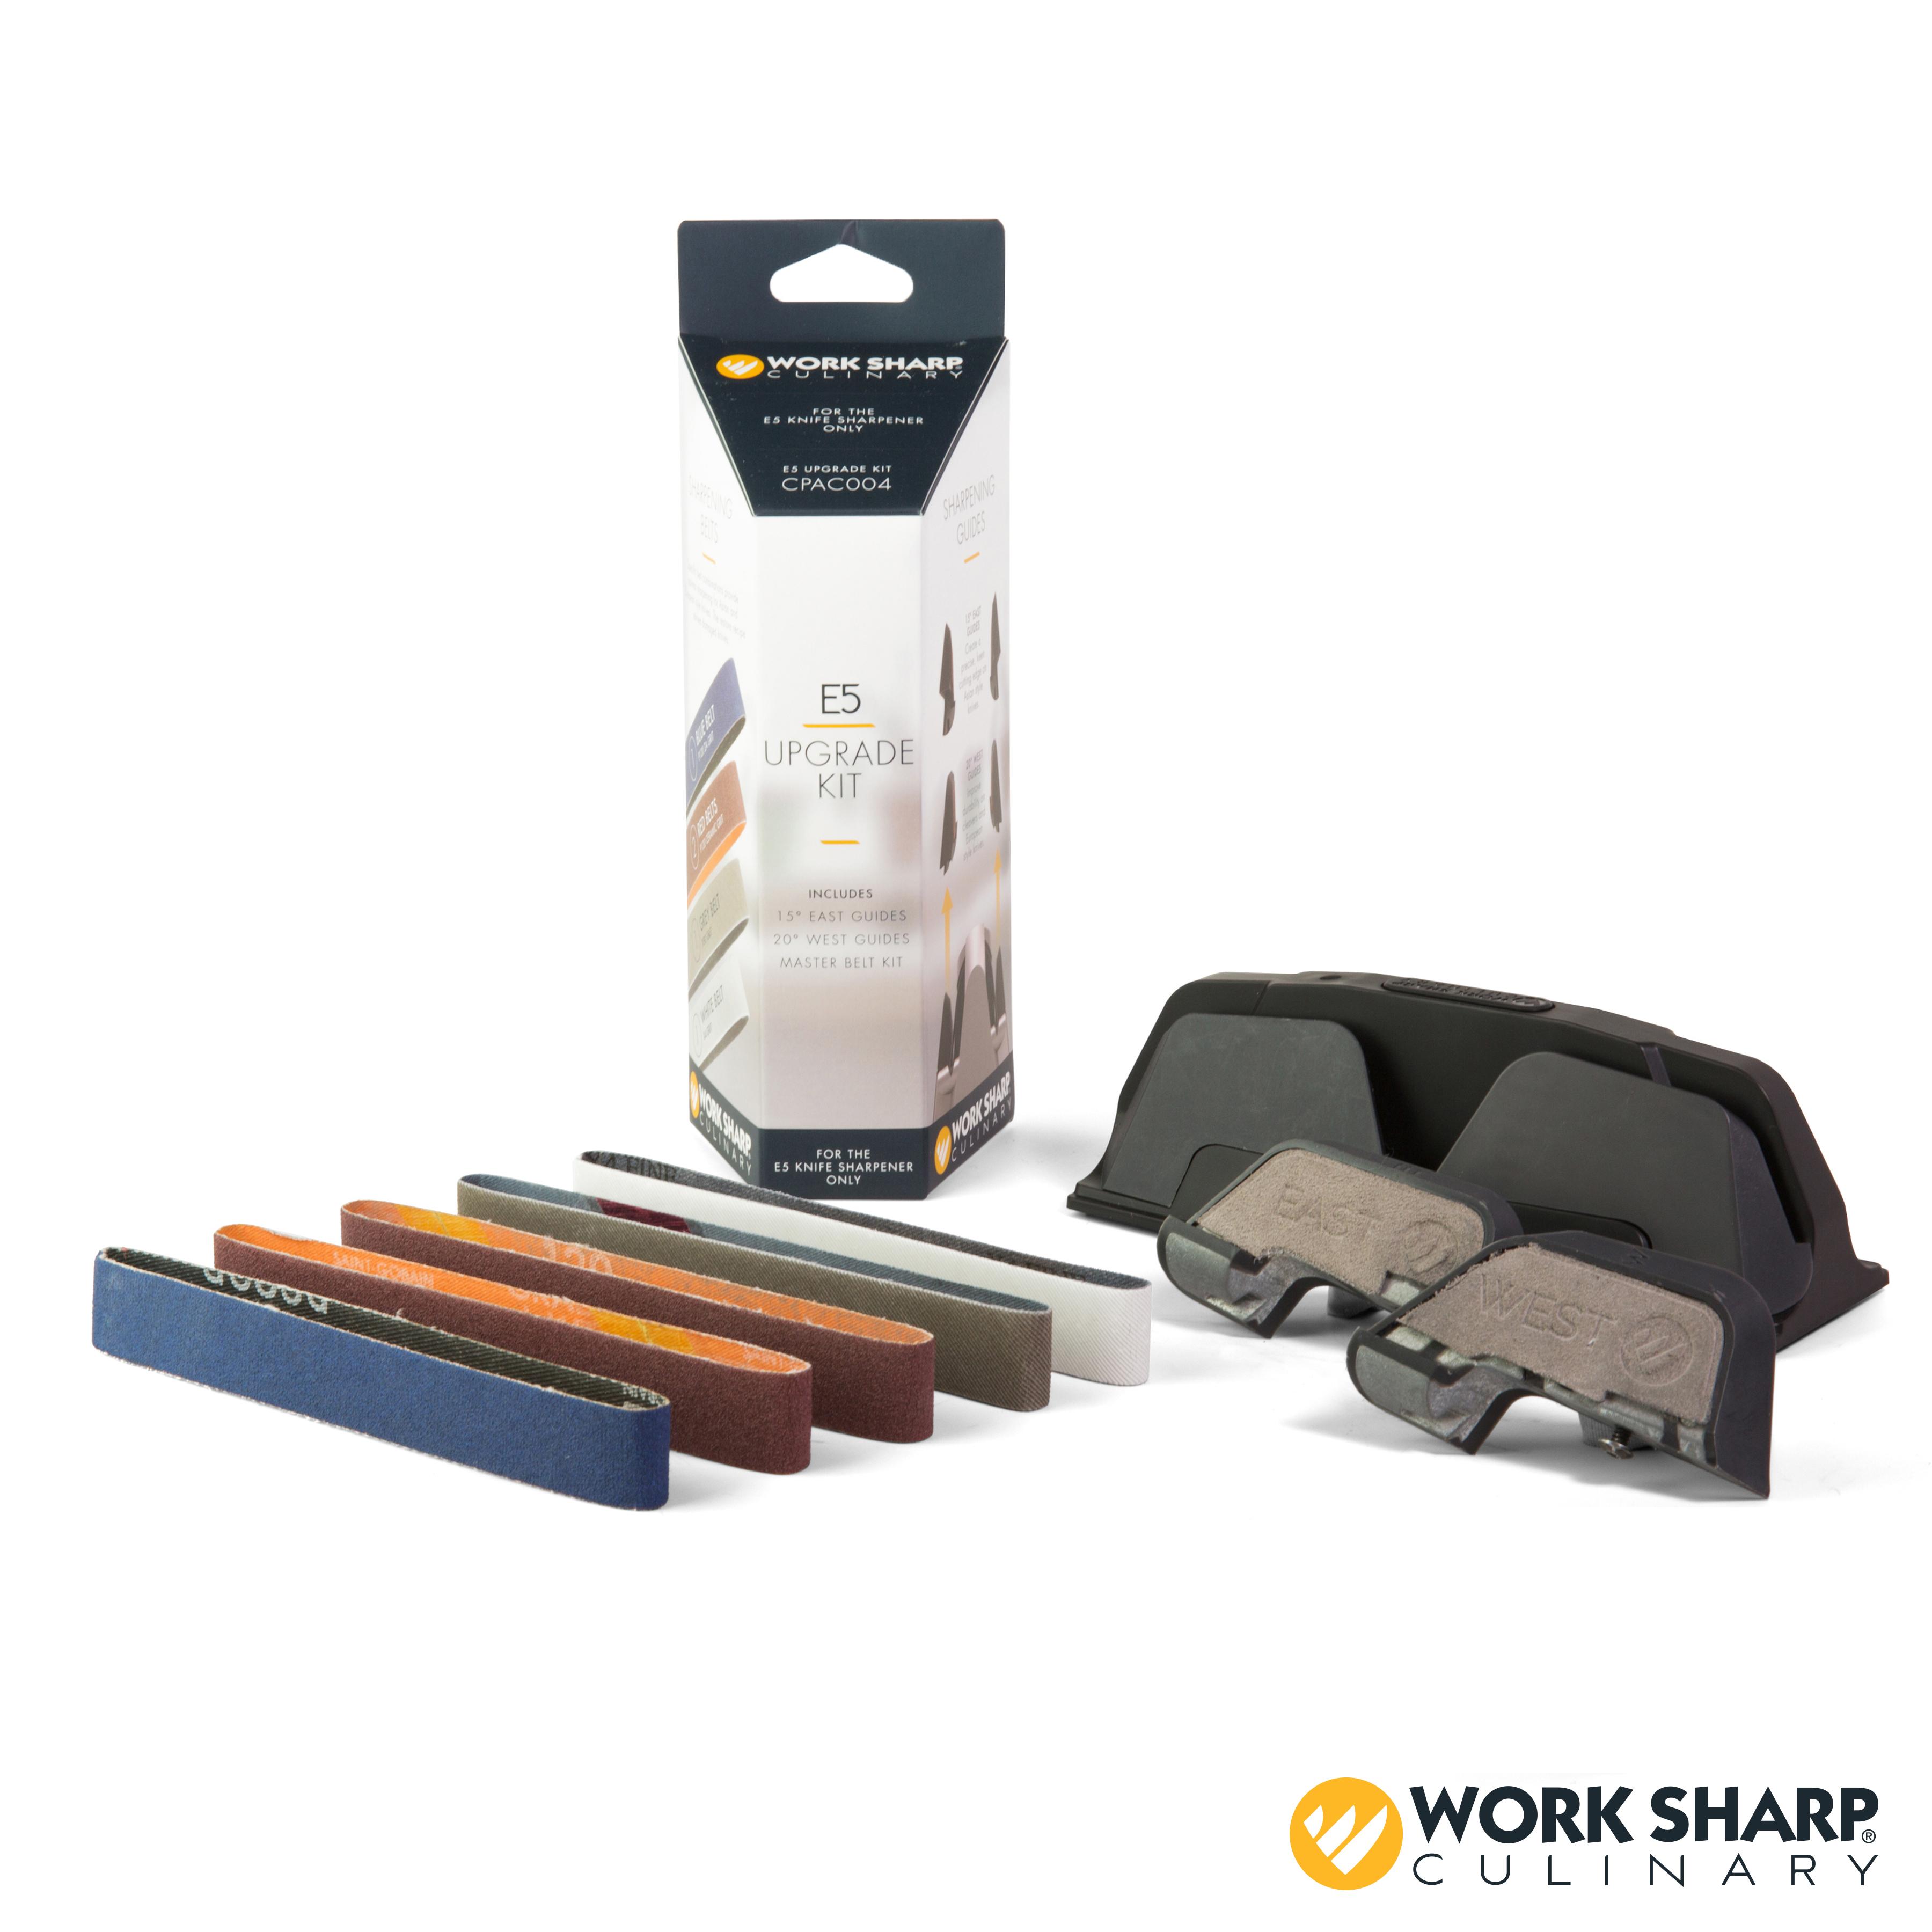 Work Sharp Culinary E5 Electric Kitchen Knife Sharpener Upgrade Kit